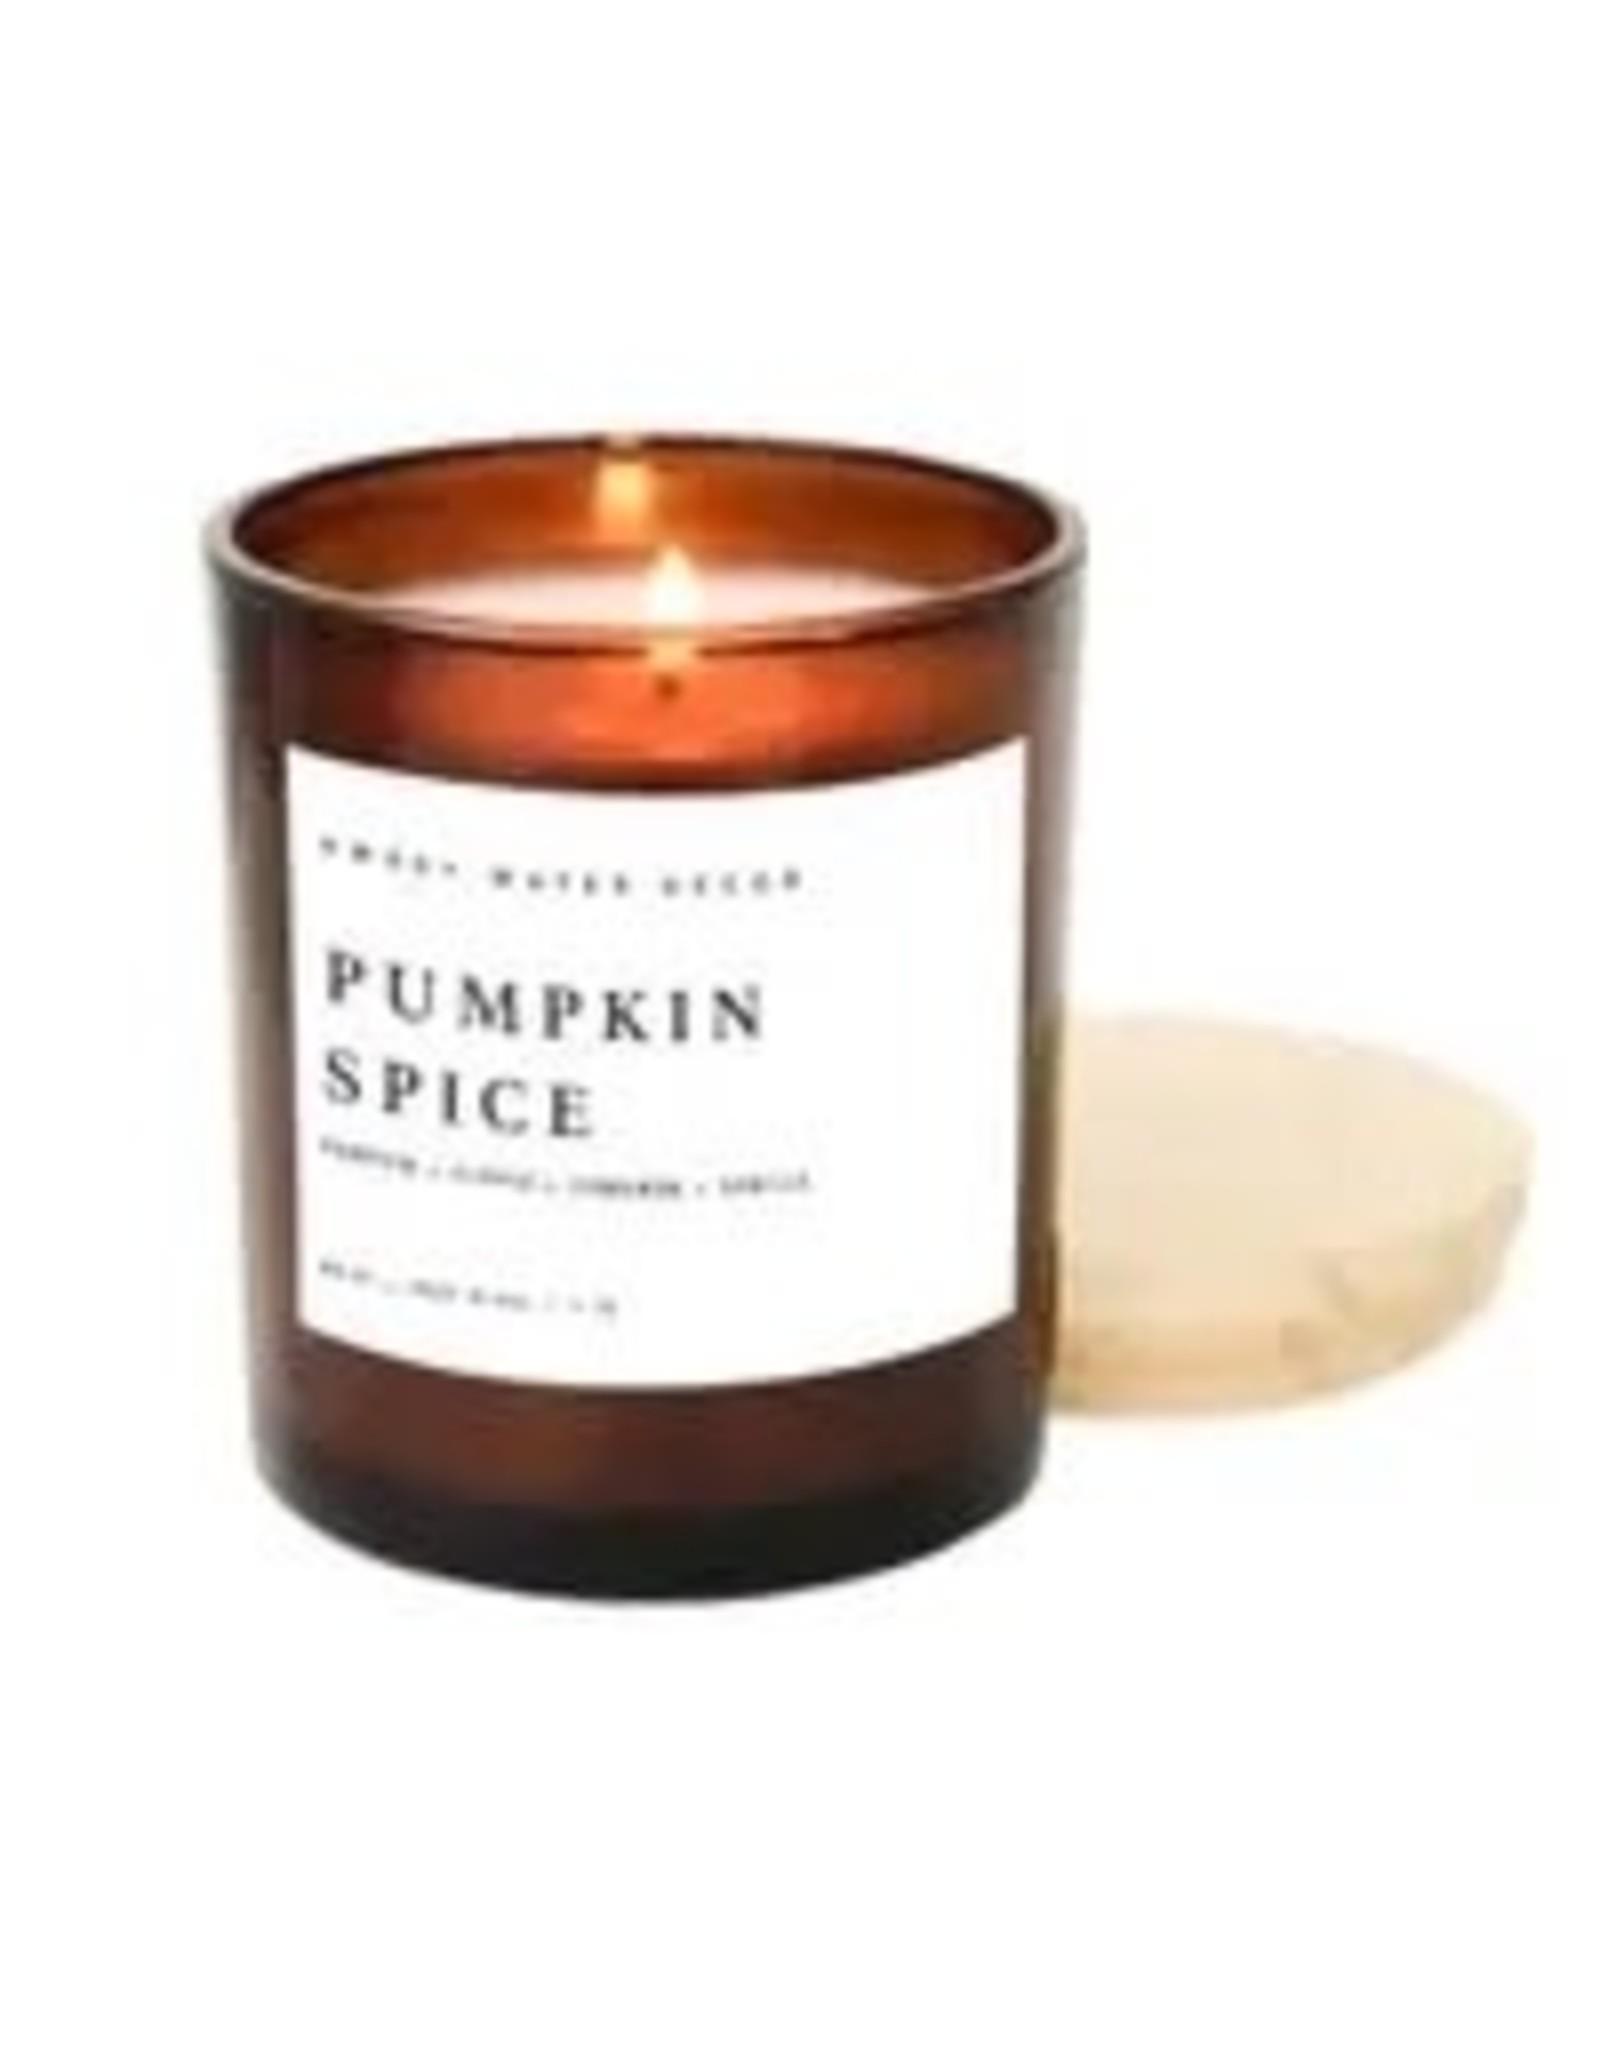 The Florist & The Merchant Pumpkin Spice Home Fragrance